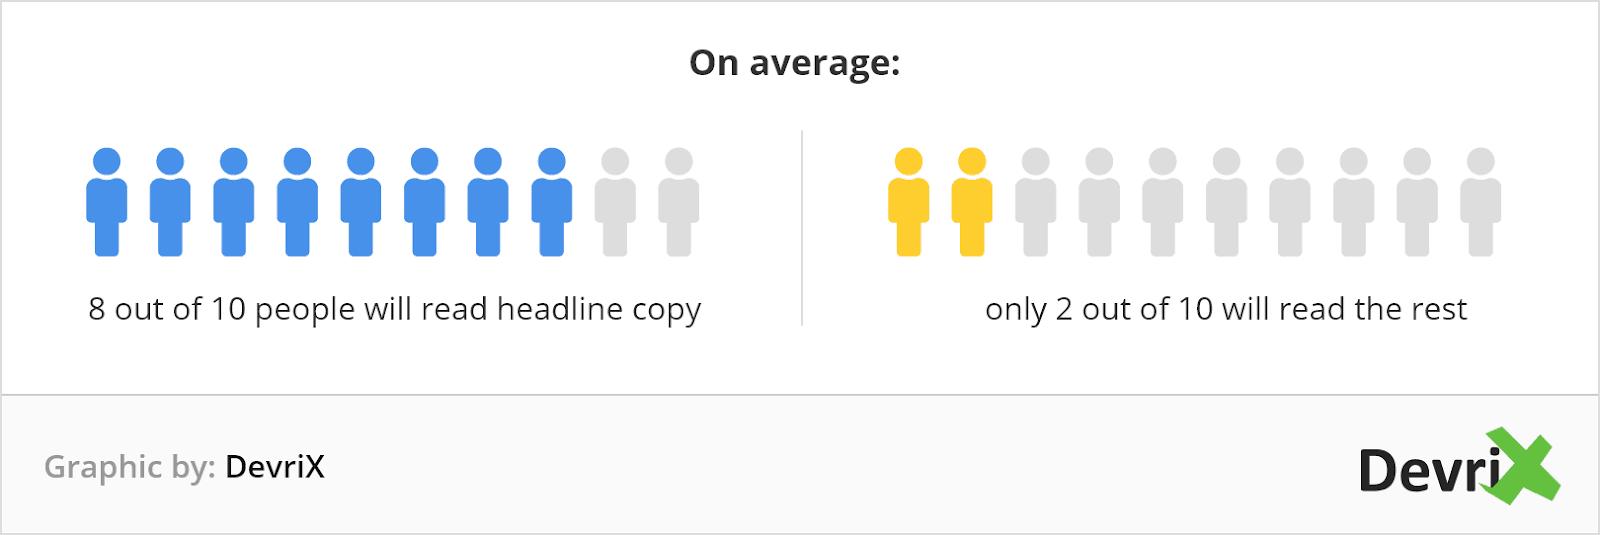 readers statistics